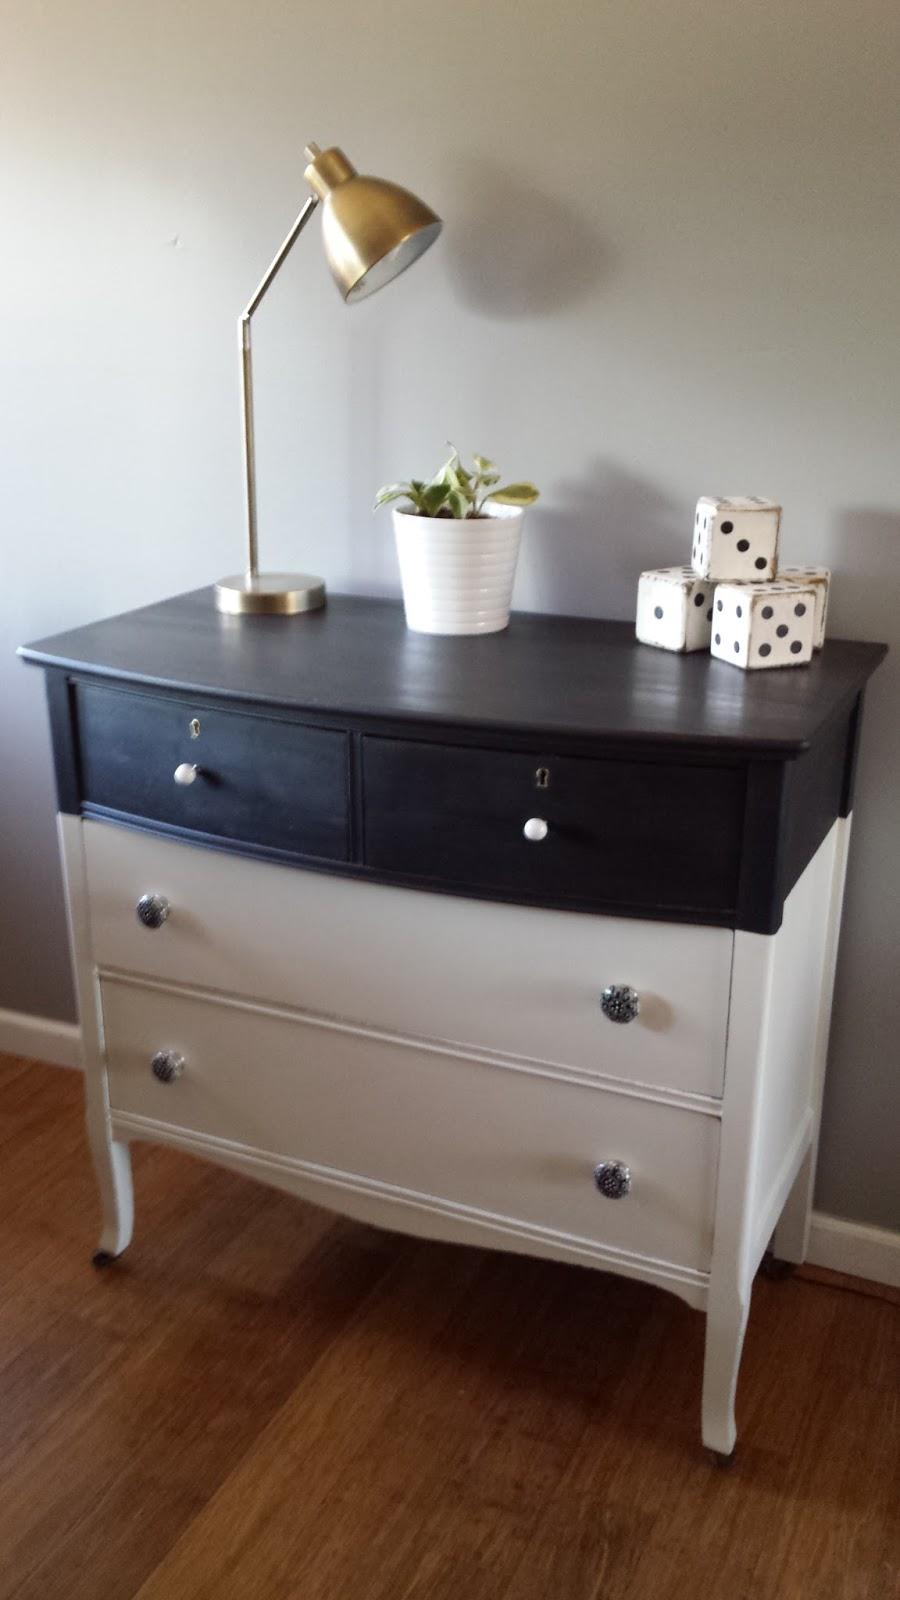 lilly 39 s home designs white and black farmhouse dresser. Black Bedroom Furniture Sets. Home Design Ideas